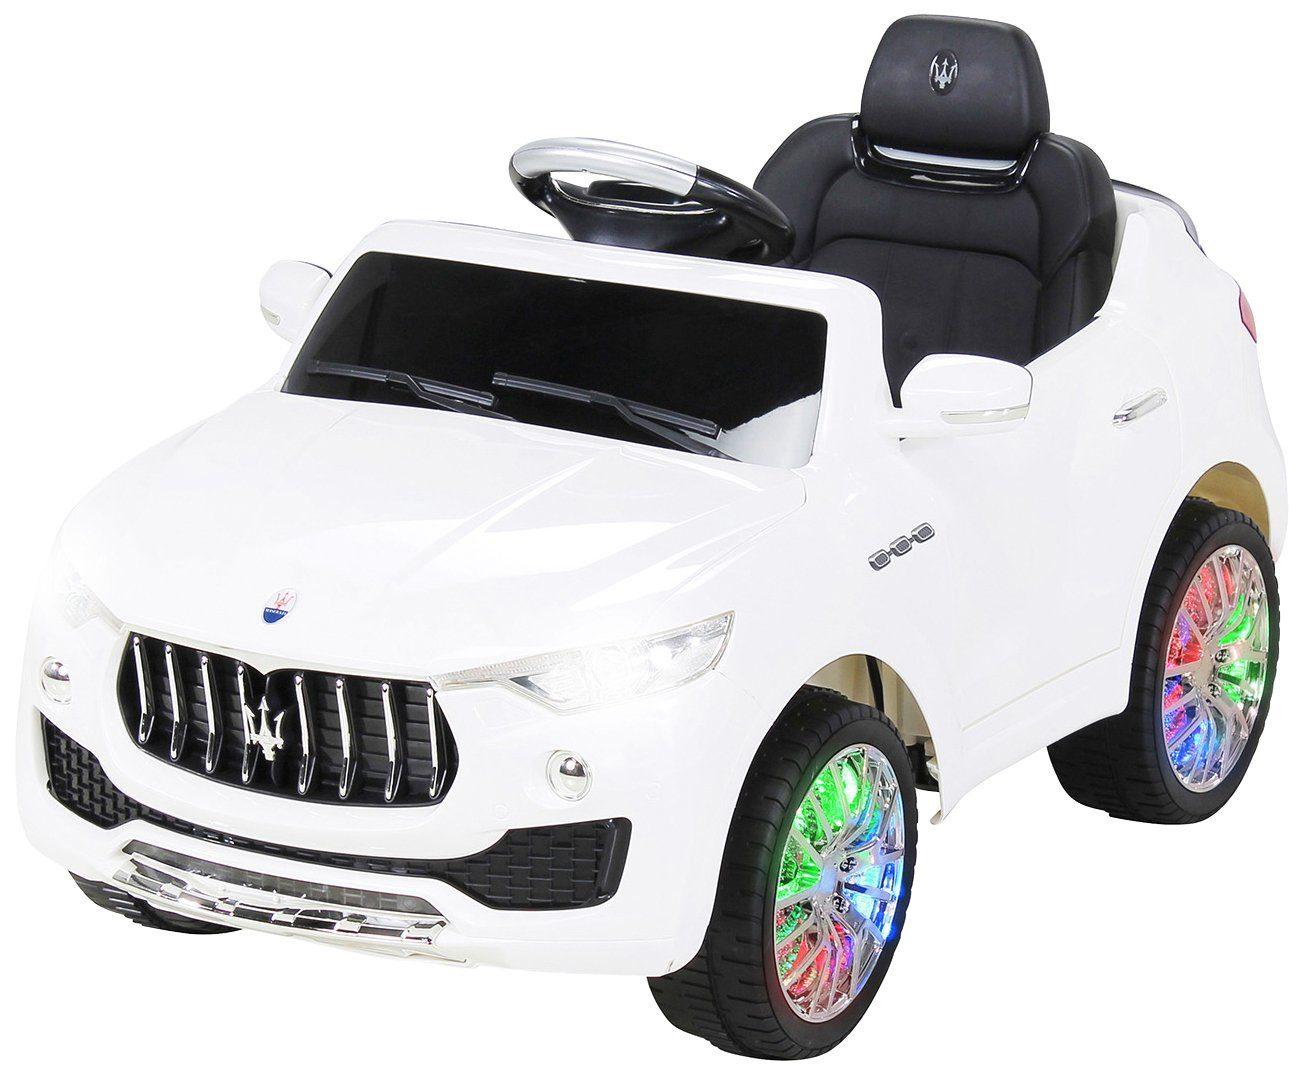 ACTIONBIKES MOTORS Elektroauto »Maserati Levante SUV«, für Kinder ab 3 Jahre, 12 Volt